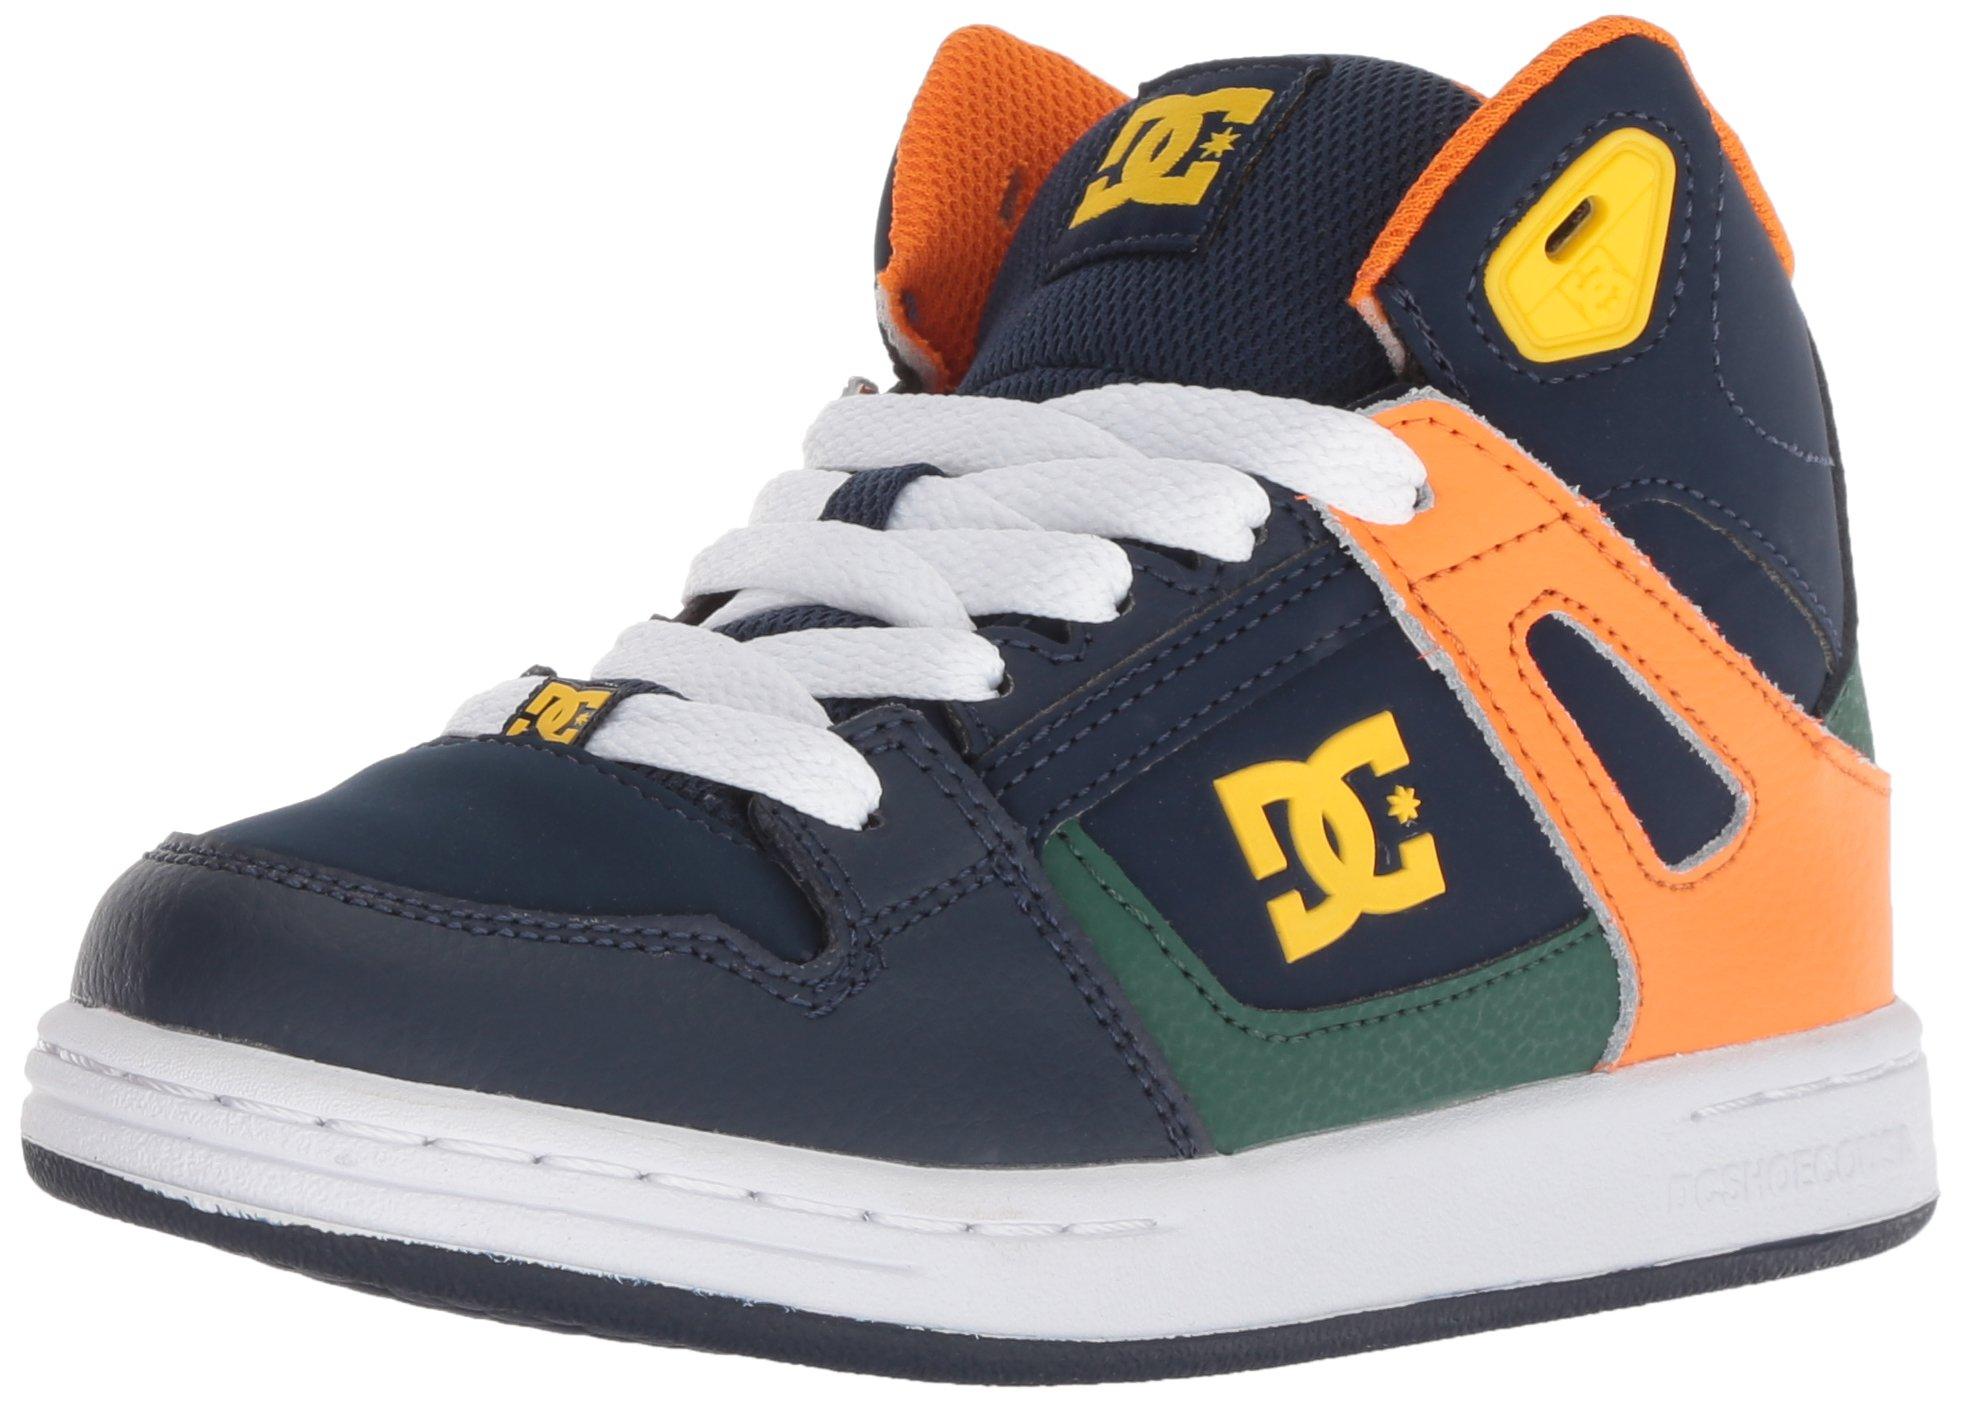 DC Boys' Pure HIGH-TOP Skate Shoe, Multi, 2 M US Little Kid